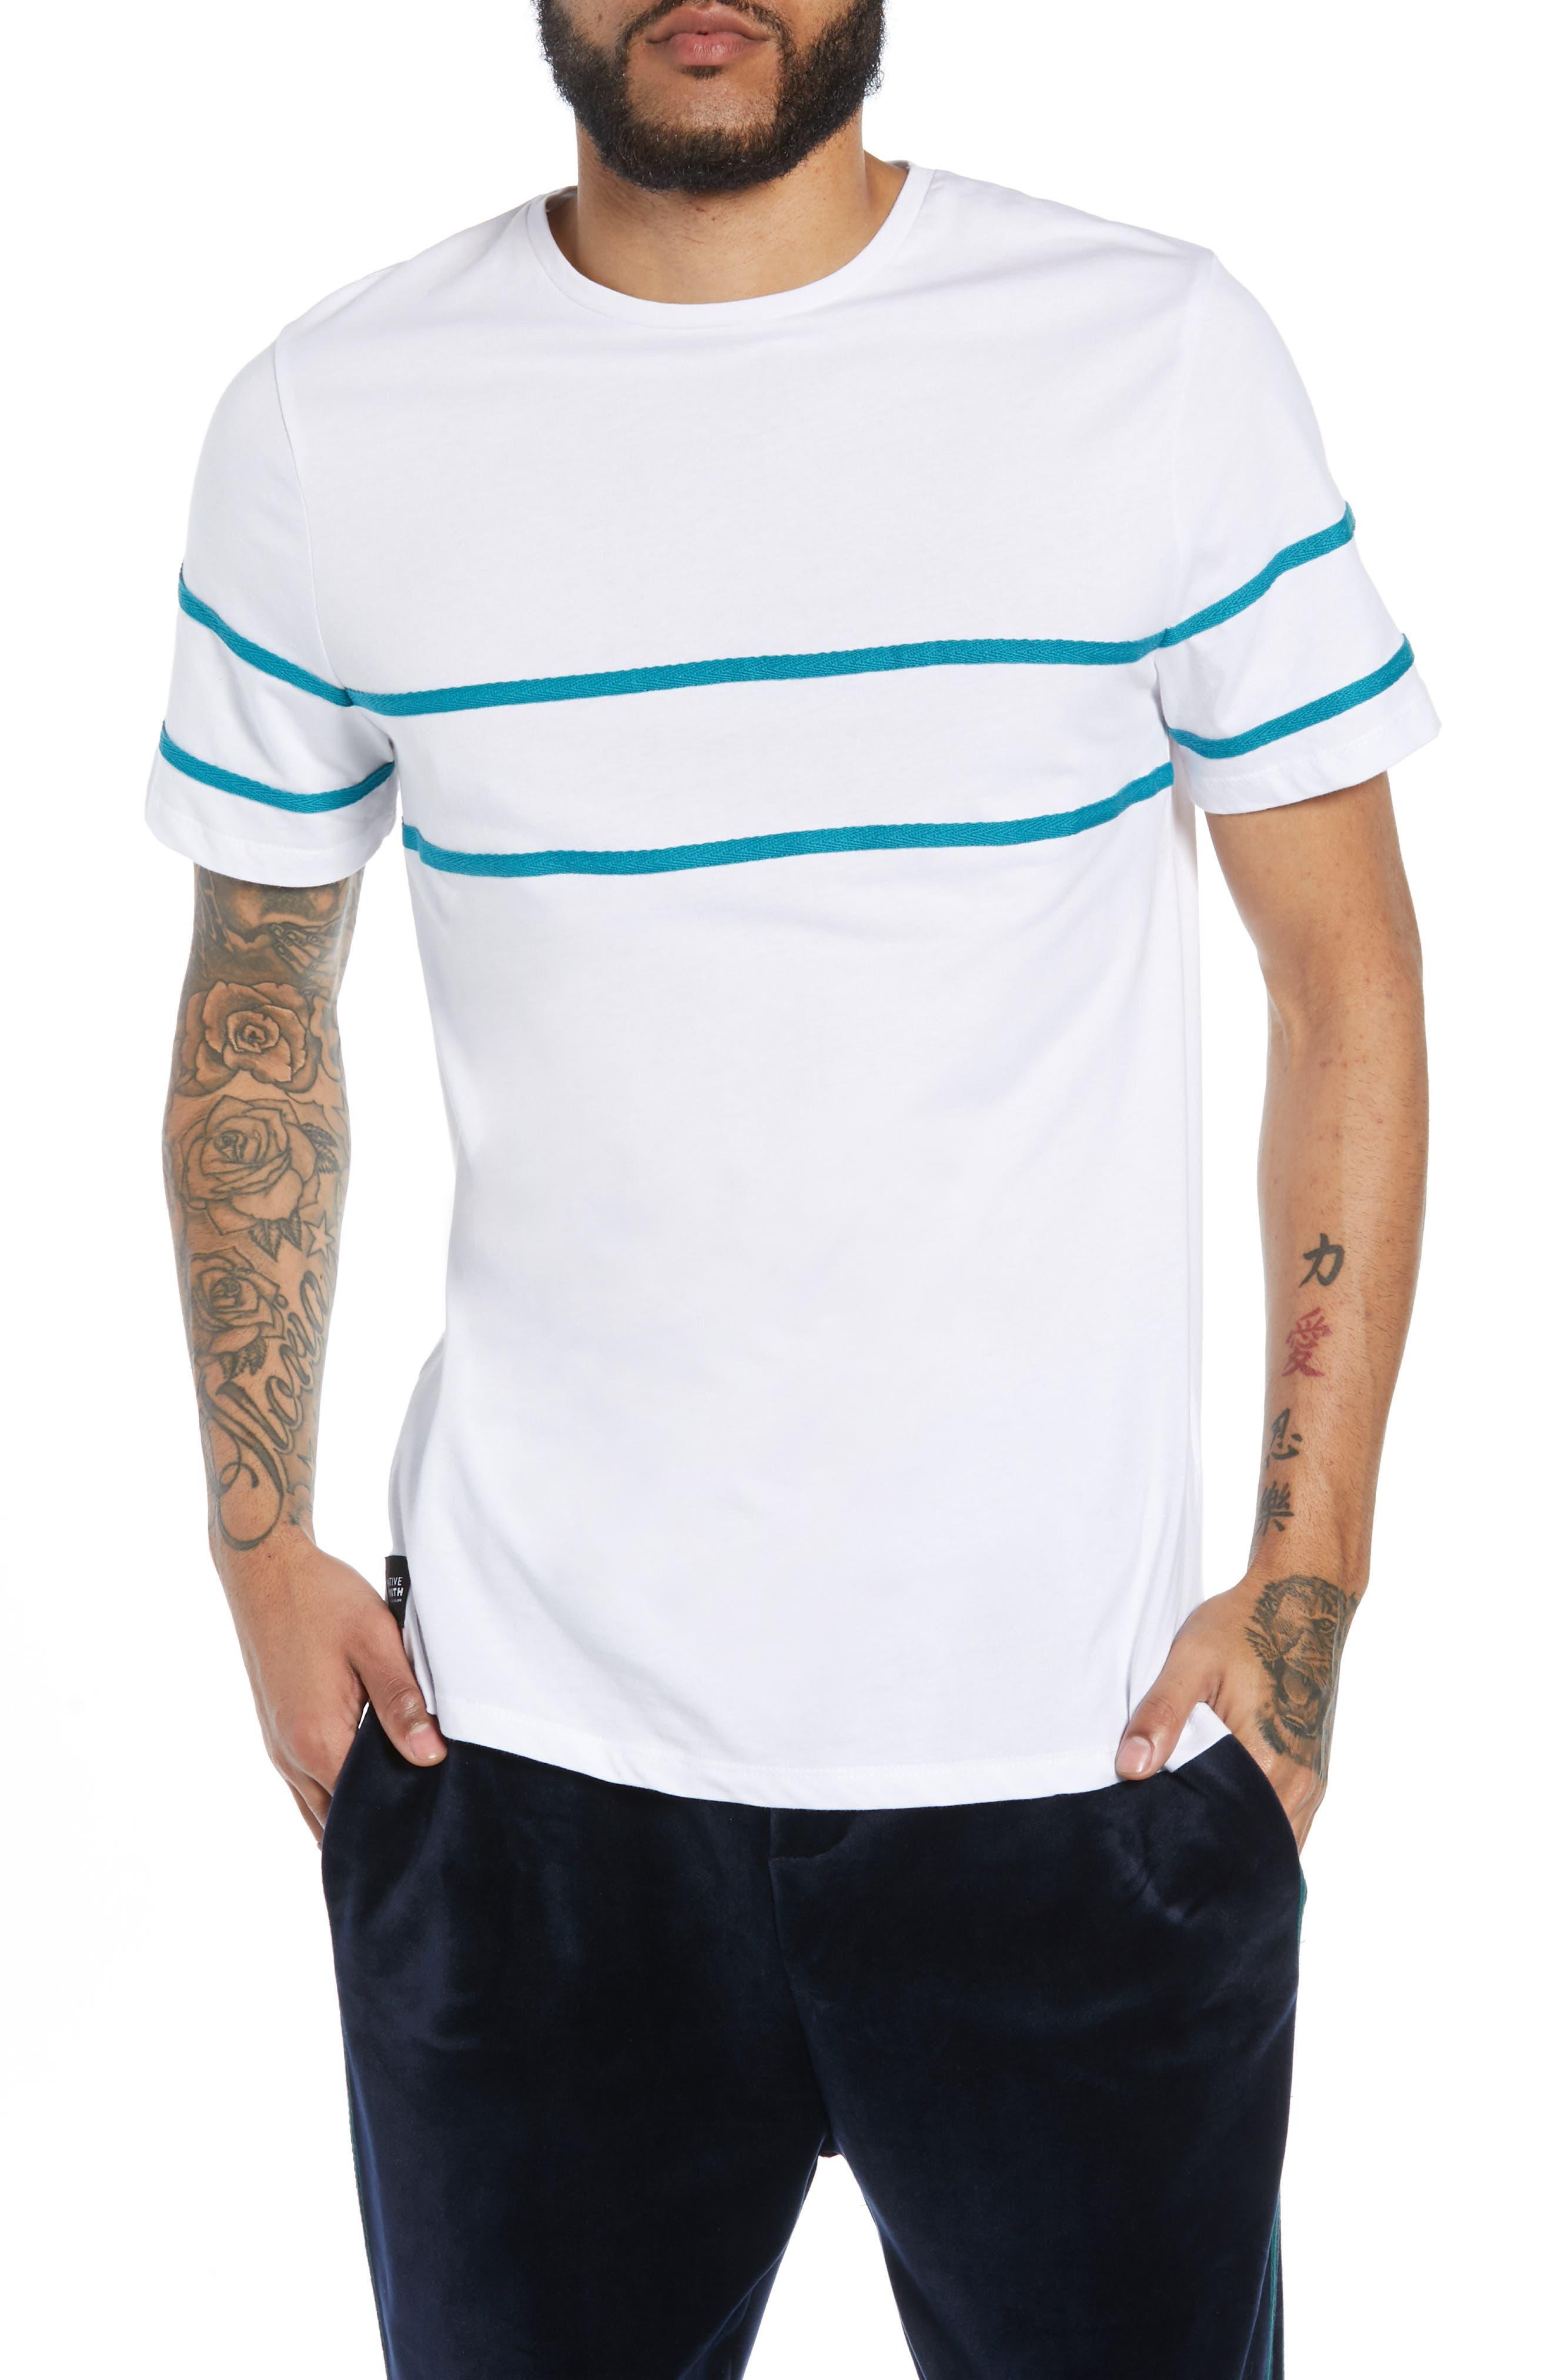 NATIVE YOUTH Herringbone Tape T-Shirt in White